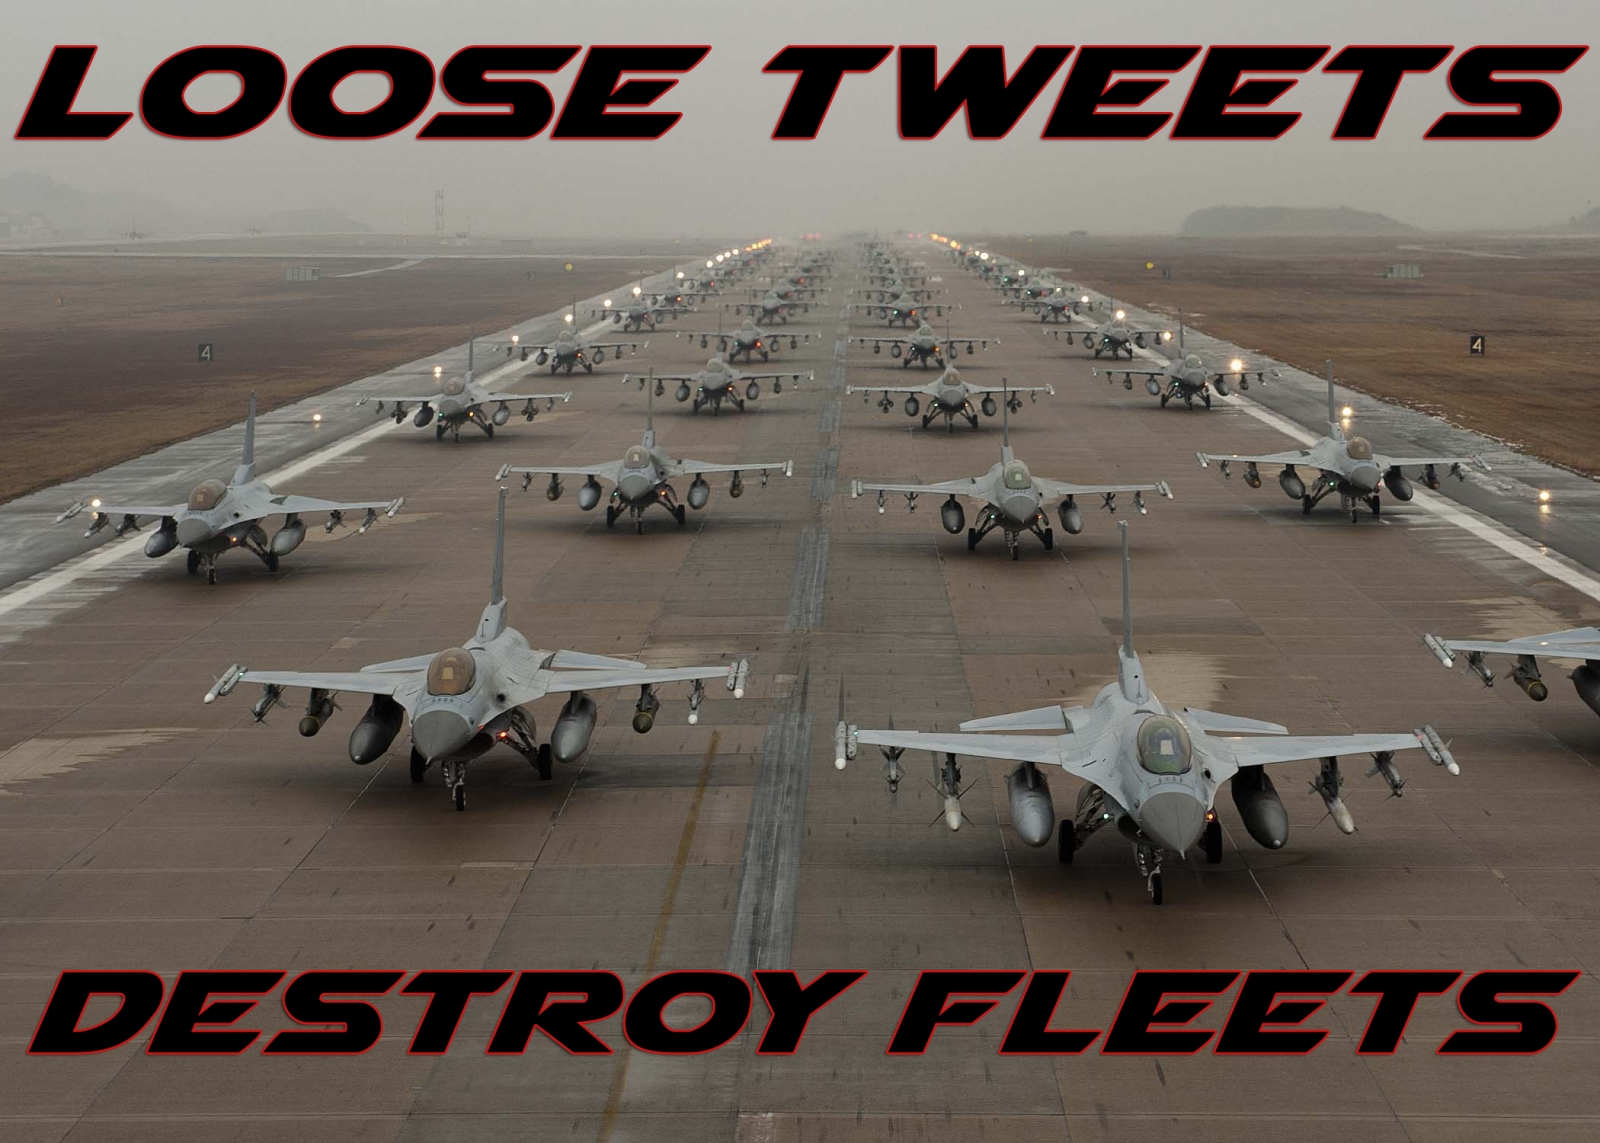 Loose Tweets Destroy Fleets Air Force campaign